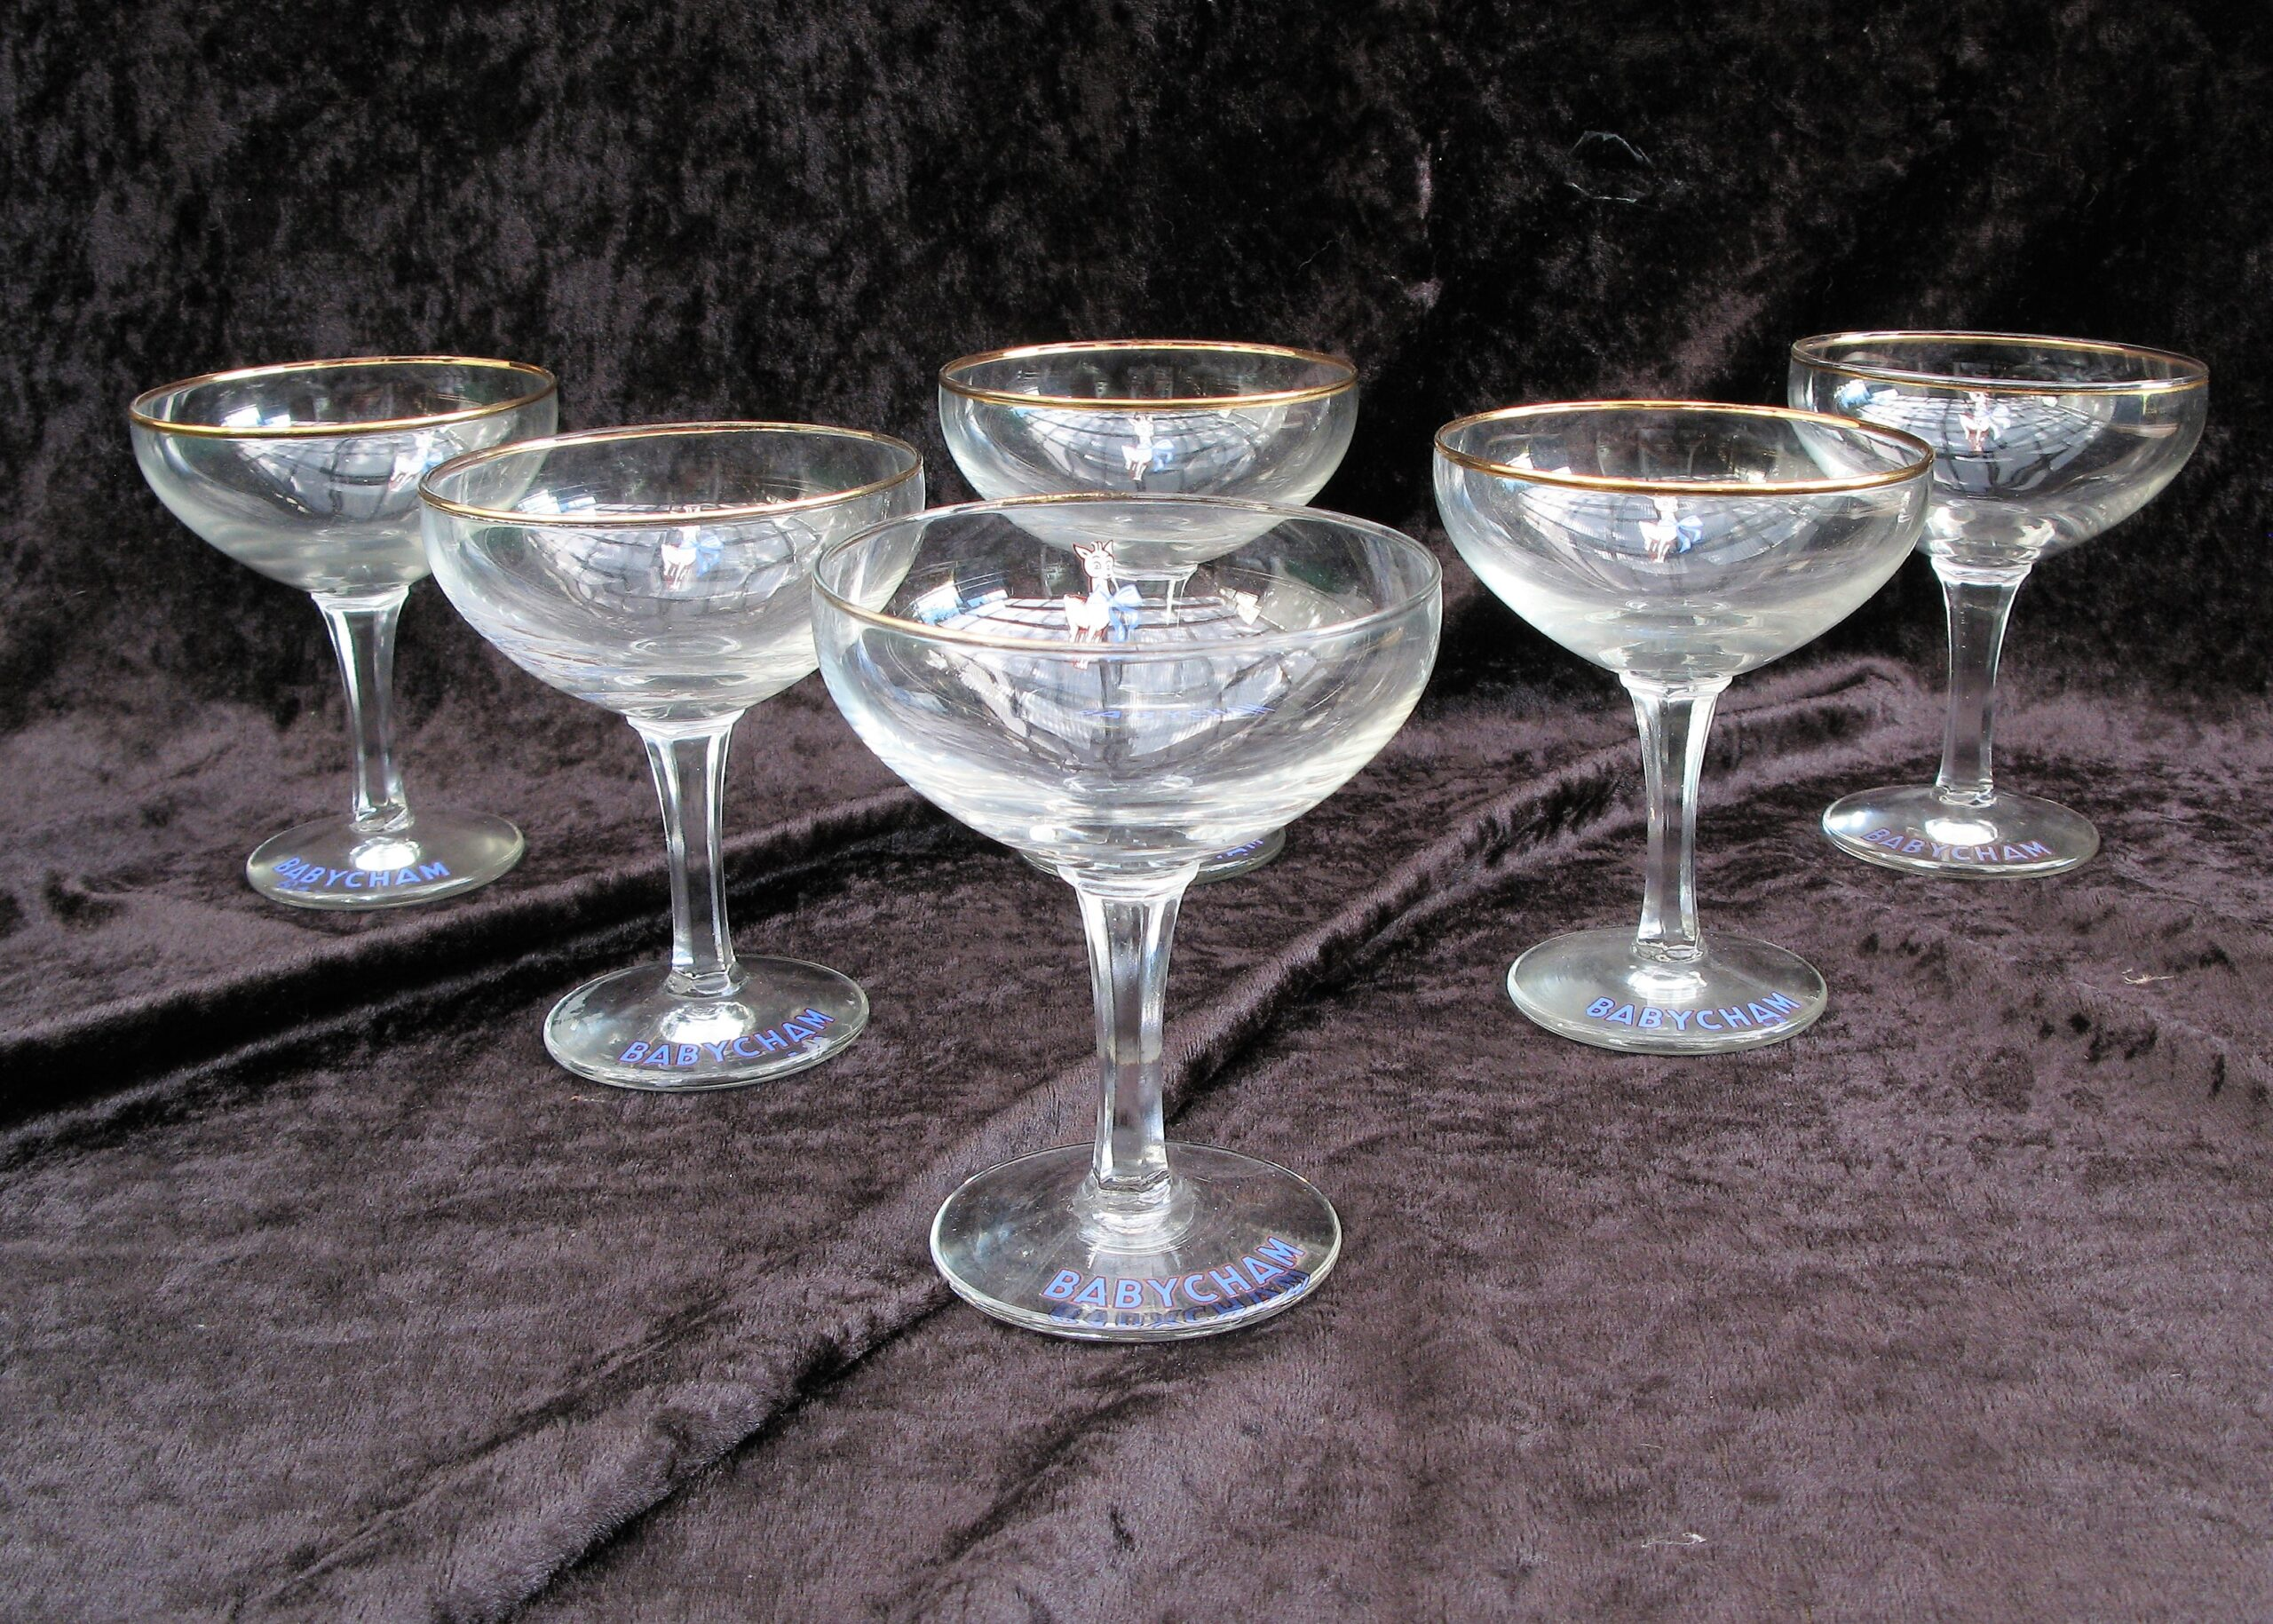 Vintage Babycham Glasses 1950s Set of 6 White Fawn